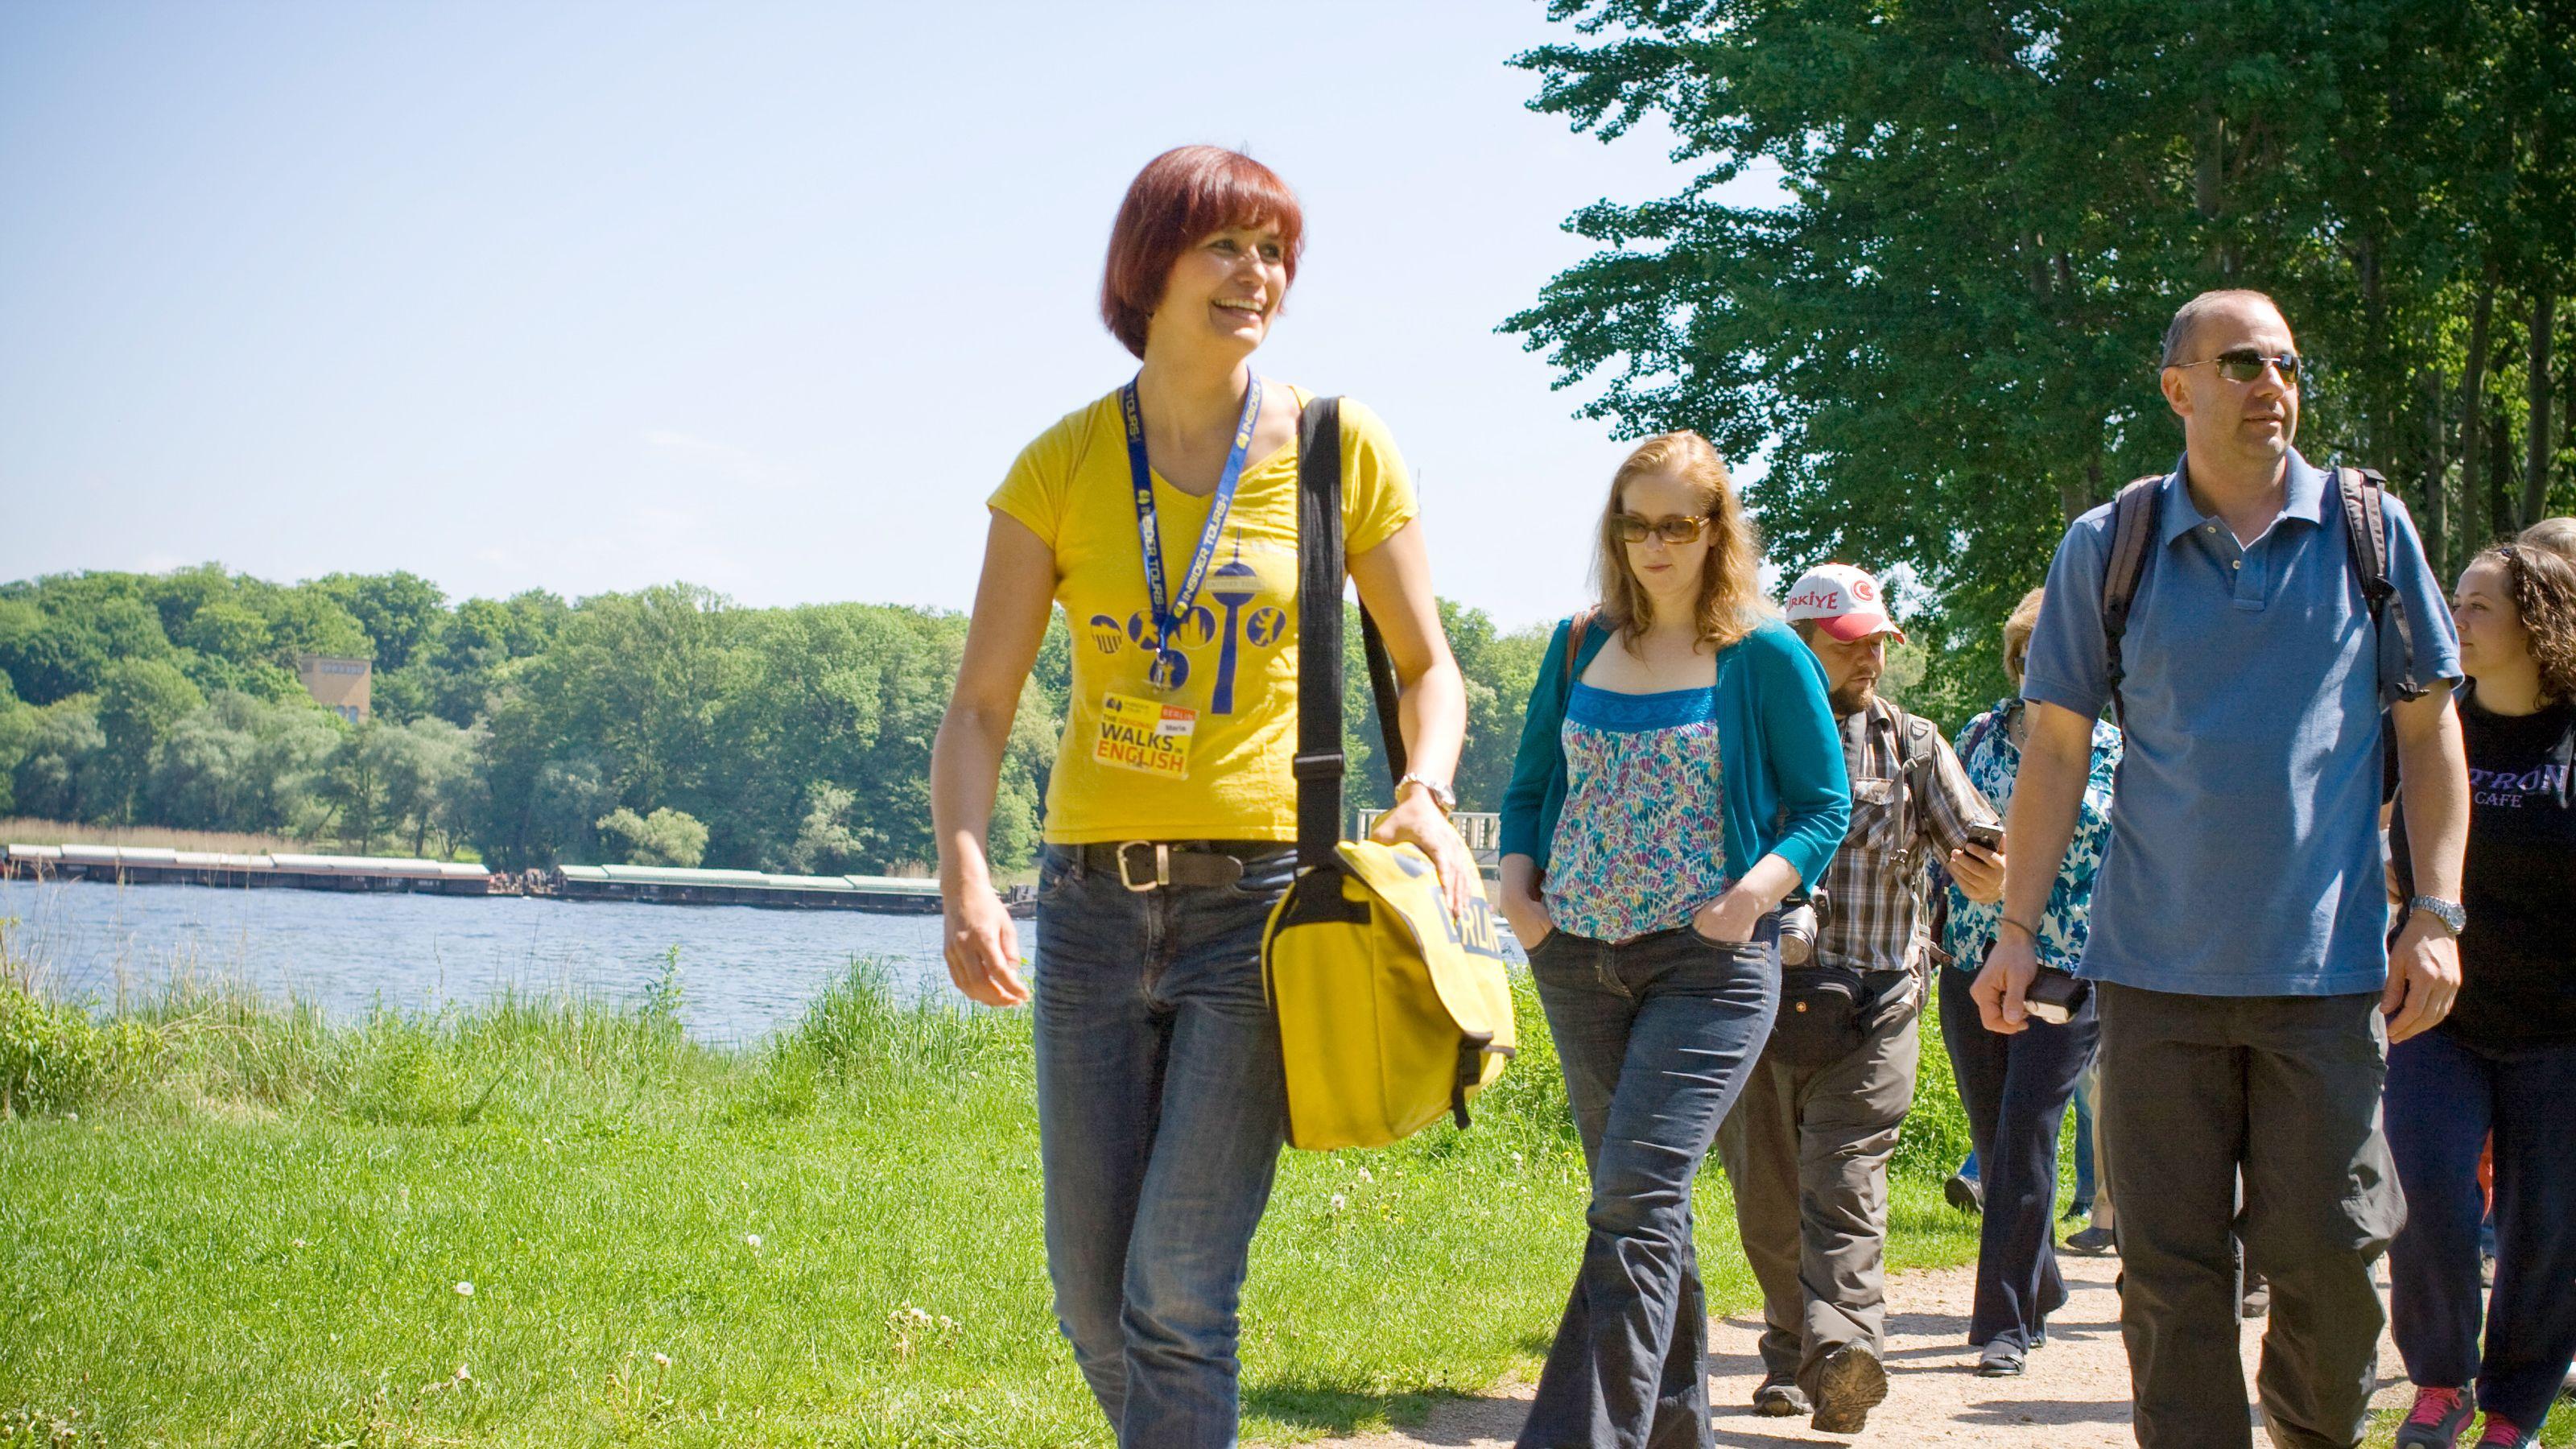 Tour group walking through a park in Potsdam